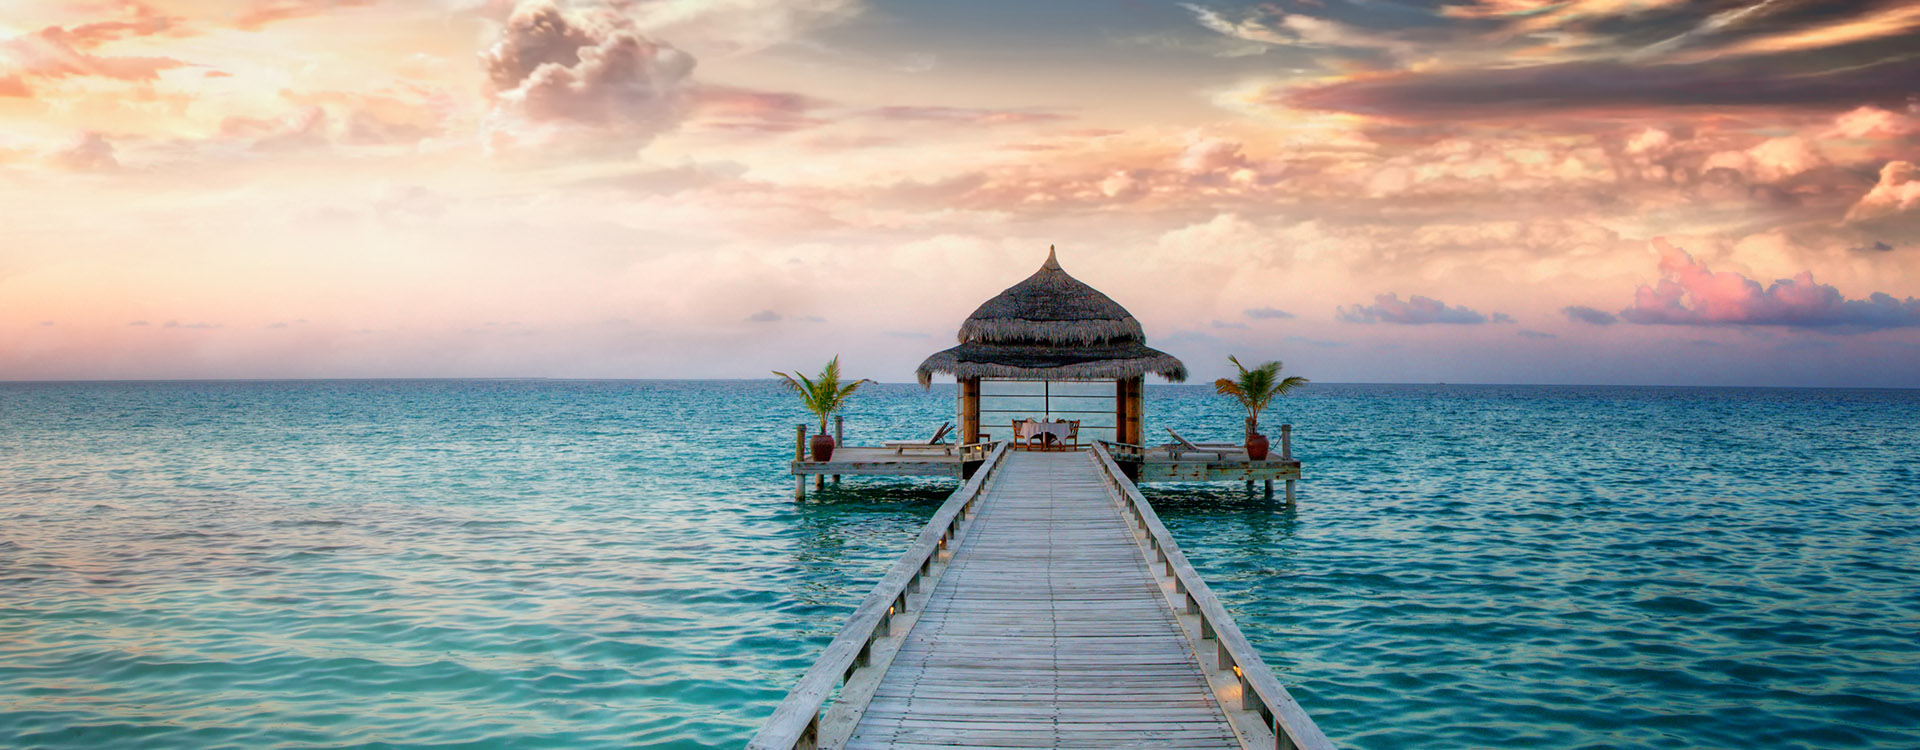 Idyllic arbor on water, Maldive Islands